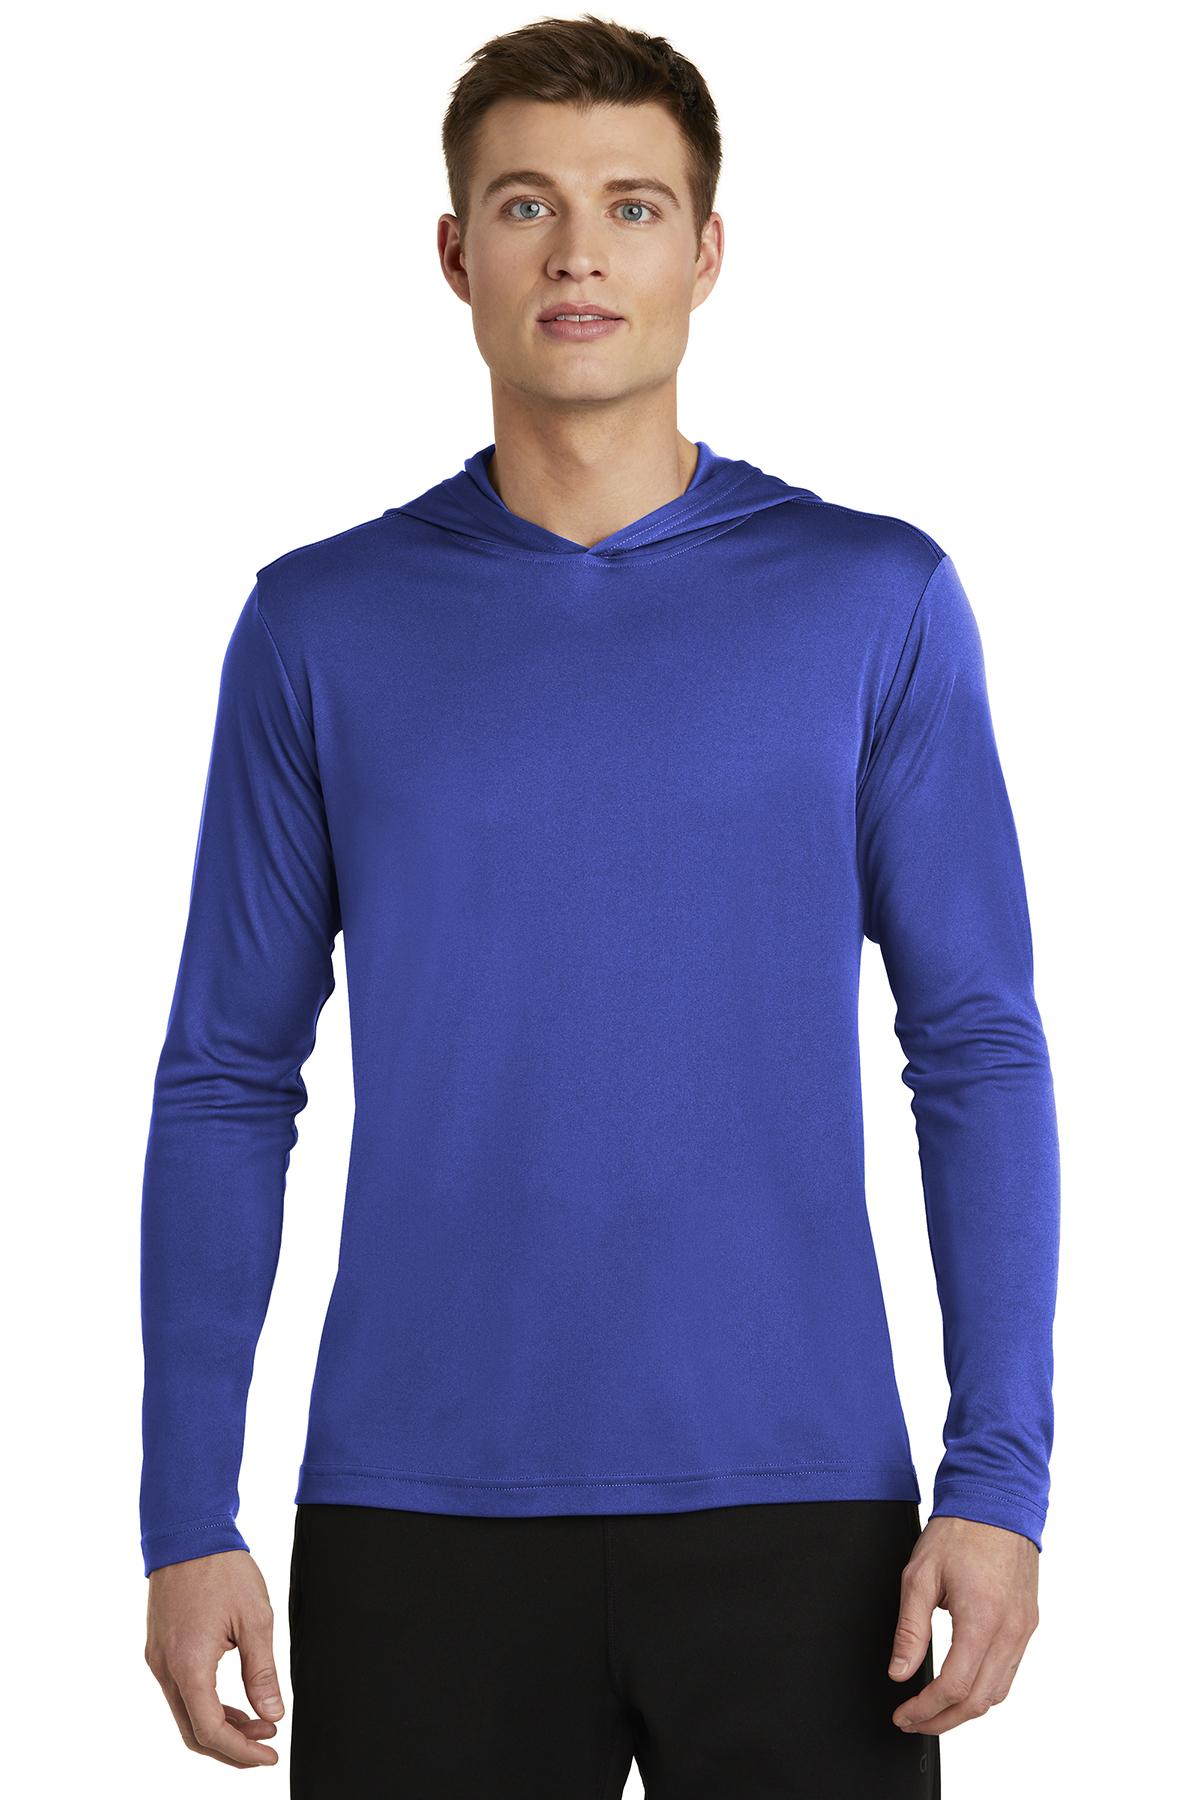 Sport Tek Posicharge Competitor Hooded Pullover T Shirts Sport Tek 4.2 out of 5 stars 52 ratings. sport tek posicharge competitor hooded pullover t shirts sport tek